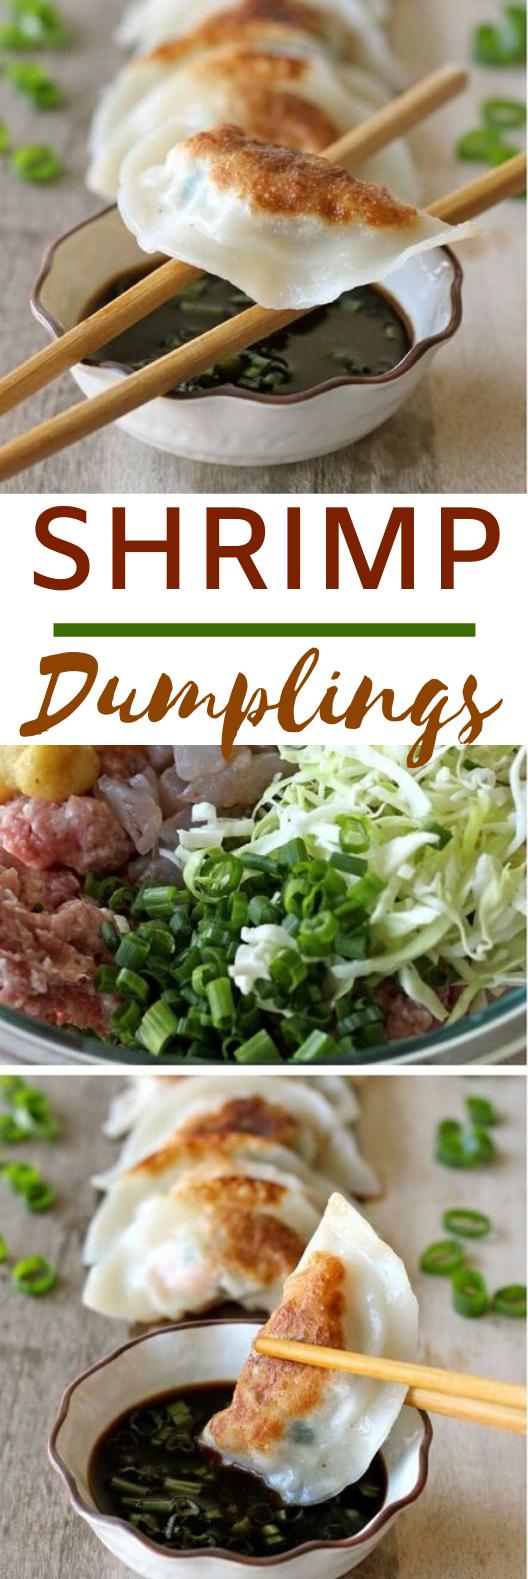 Shrimp Dumplings #dinner #chinese #recipes #shrimp #weeknight